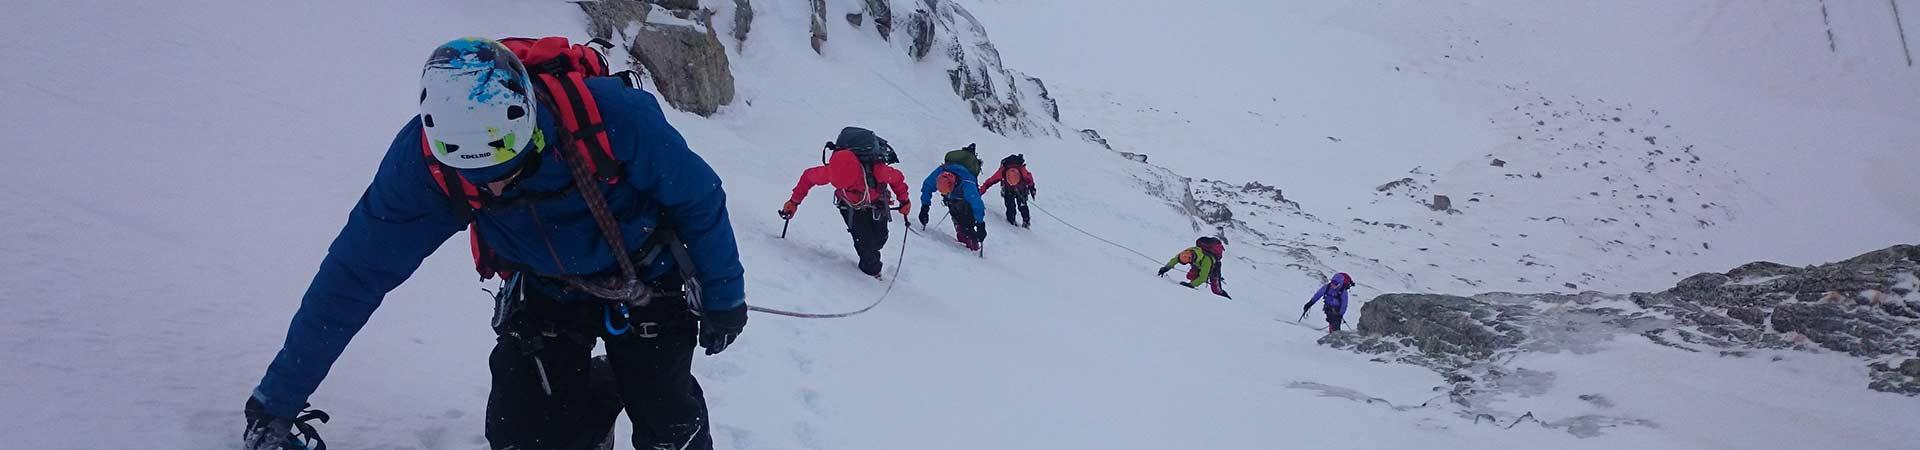 Curs-Alpinisme-Nivell-Mig-4-Dies